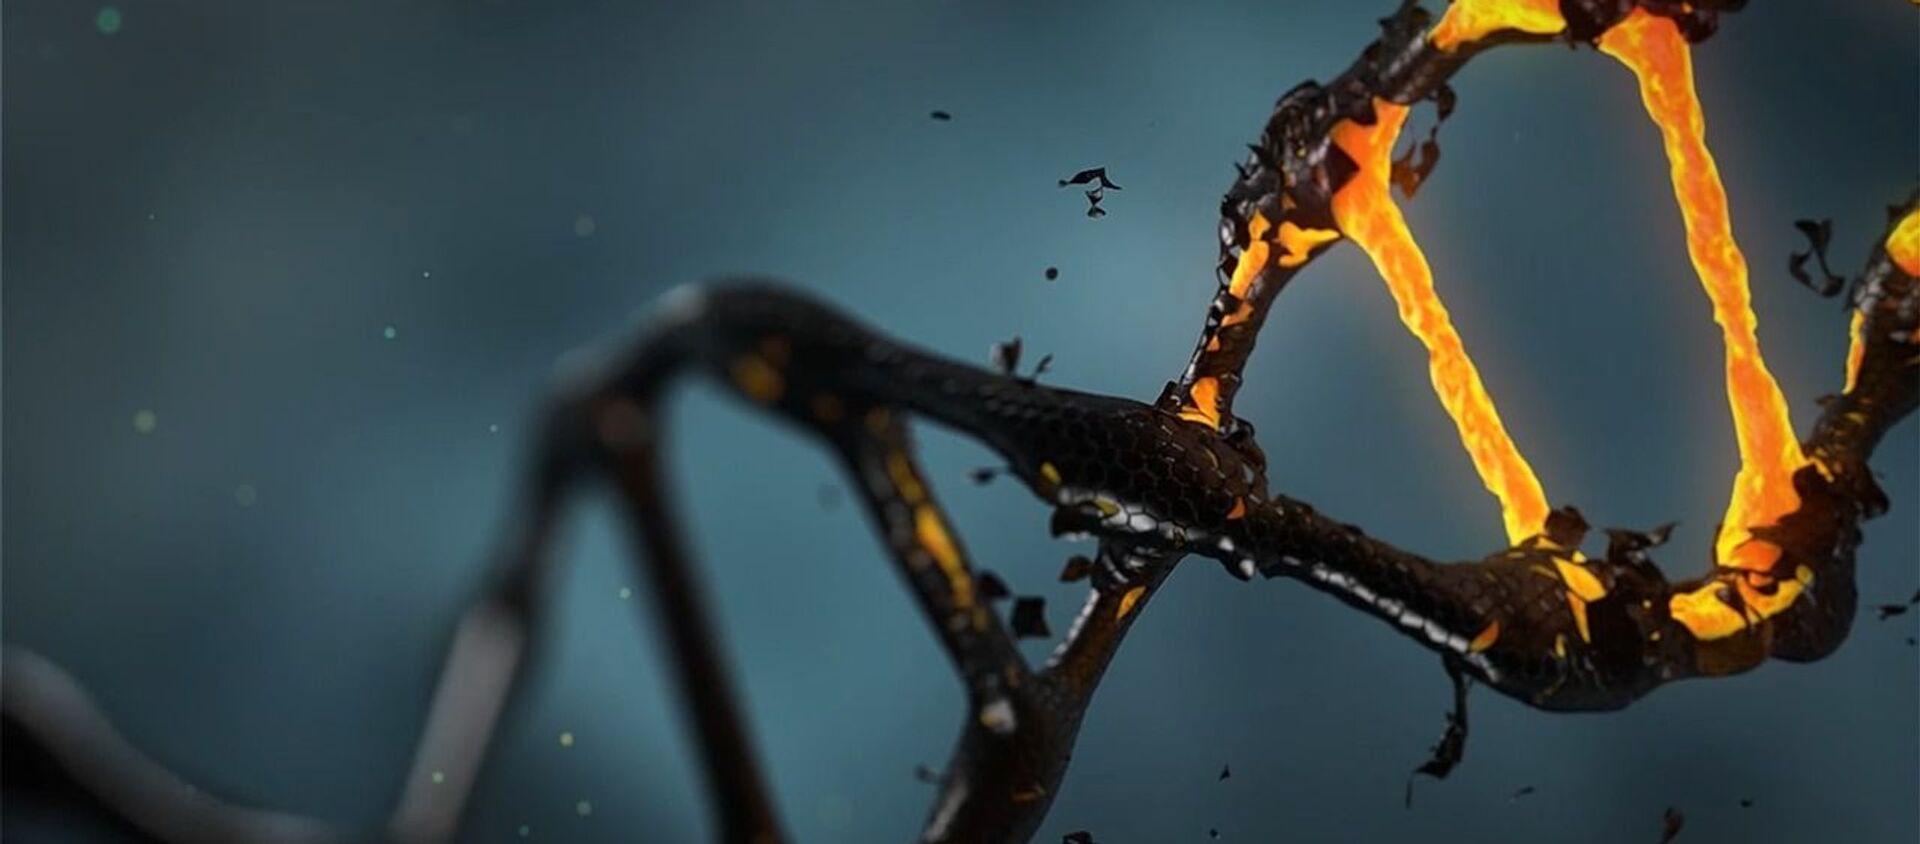 El ADN, imagen referencial - Sputnik Mundo, 1920, 06.08.2020